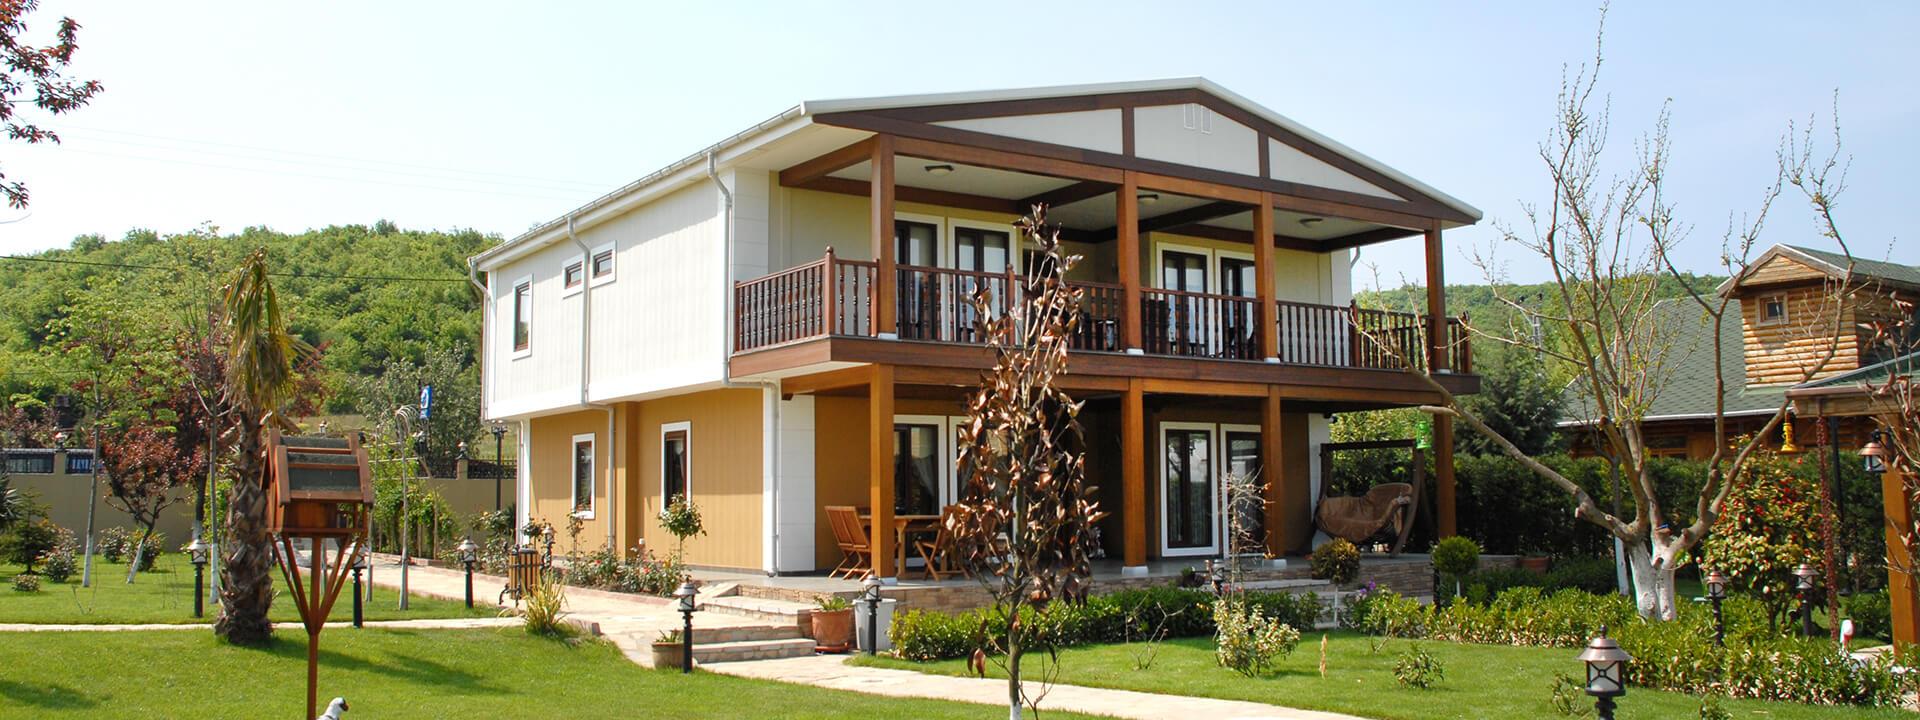 Duplex Prefabricated House Zge Yap